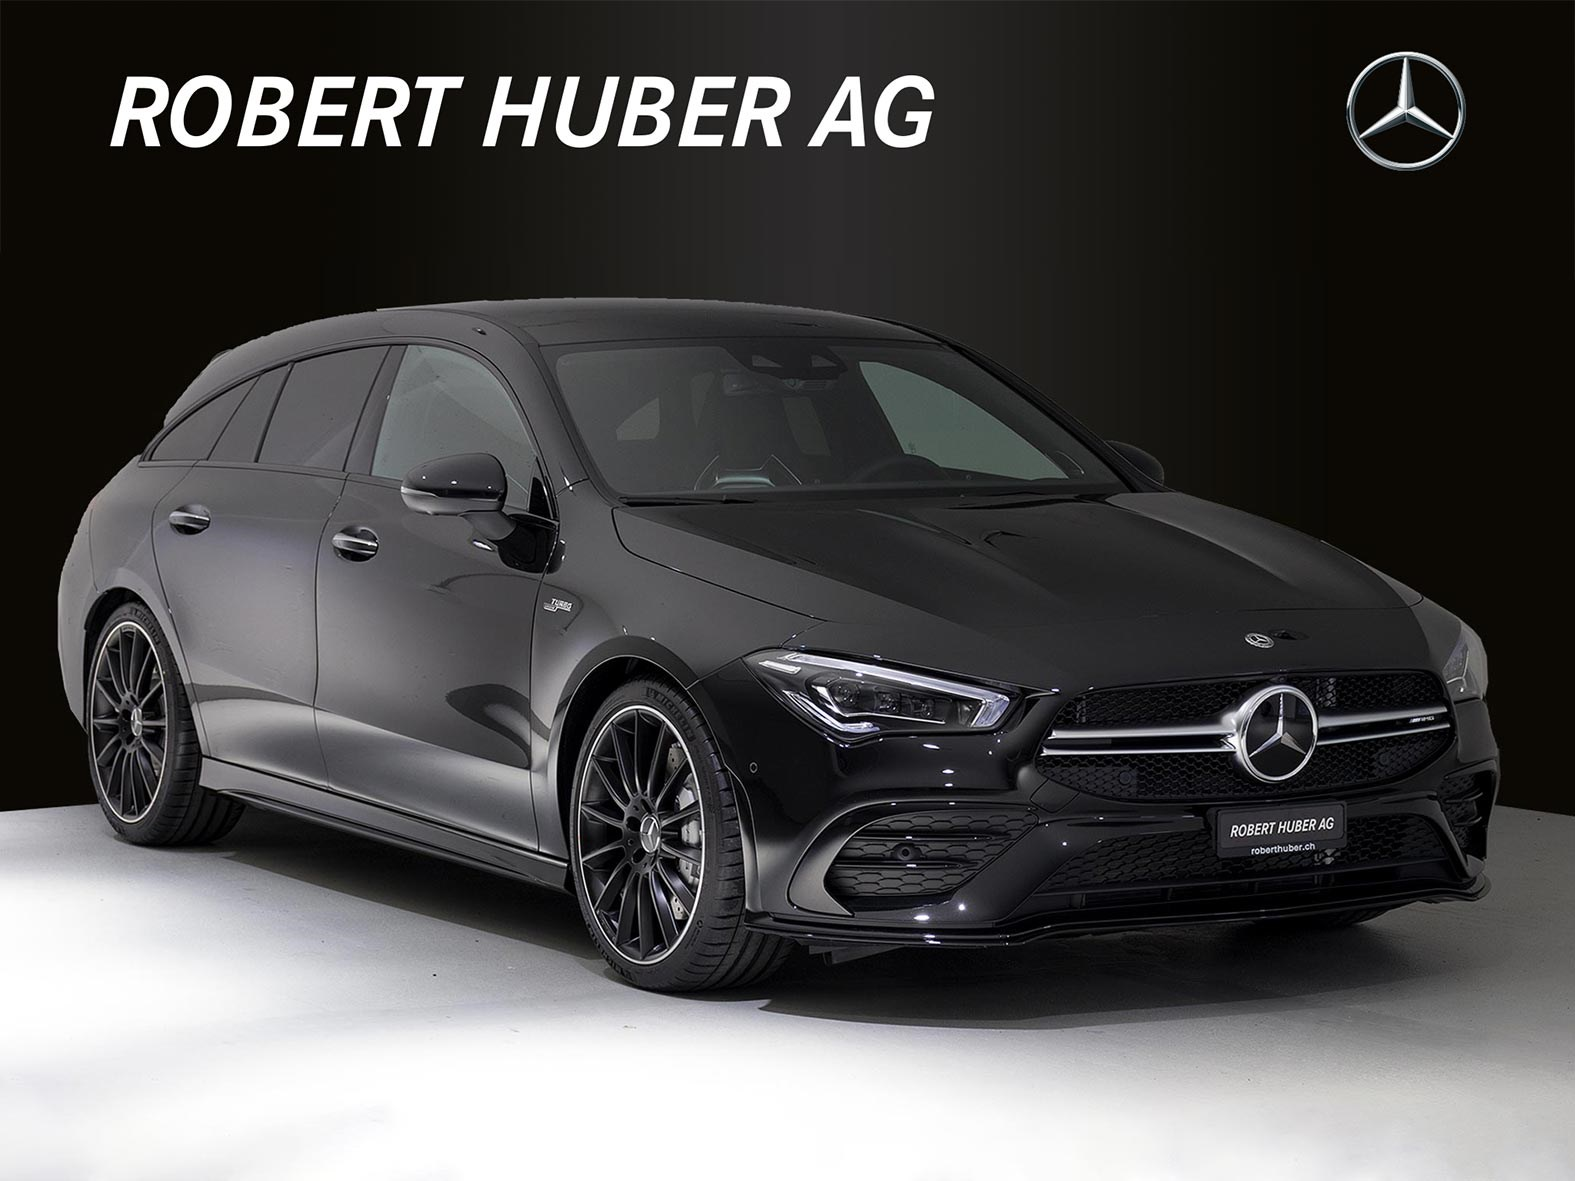 Buy Used Car Wagon Mercedes Benz Cla Klasse Cla Class Cla Shooting Brake 35 Amg 4matic 7g Dct 14300 Km At 66900 Chf On Carforyou Ch